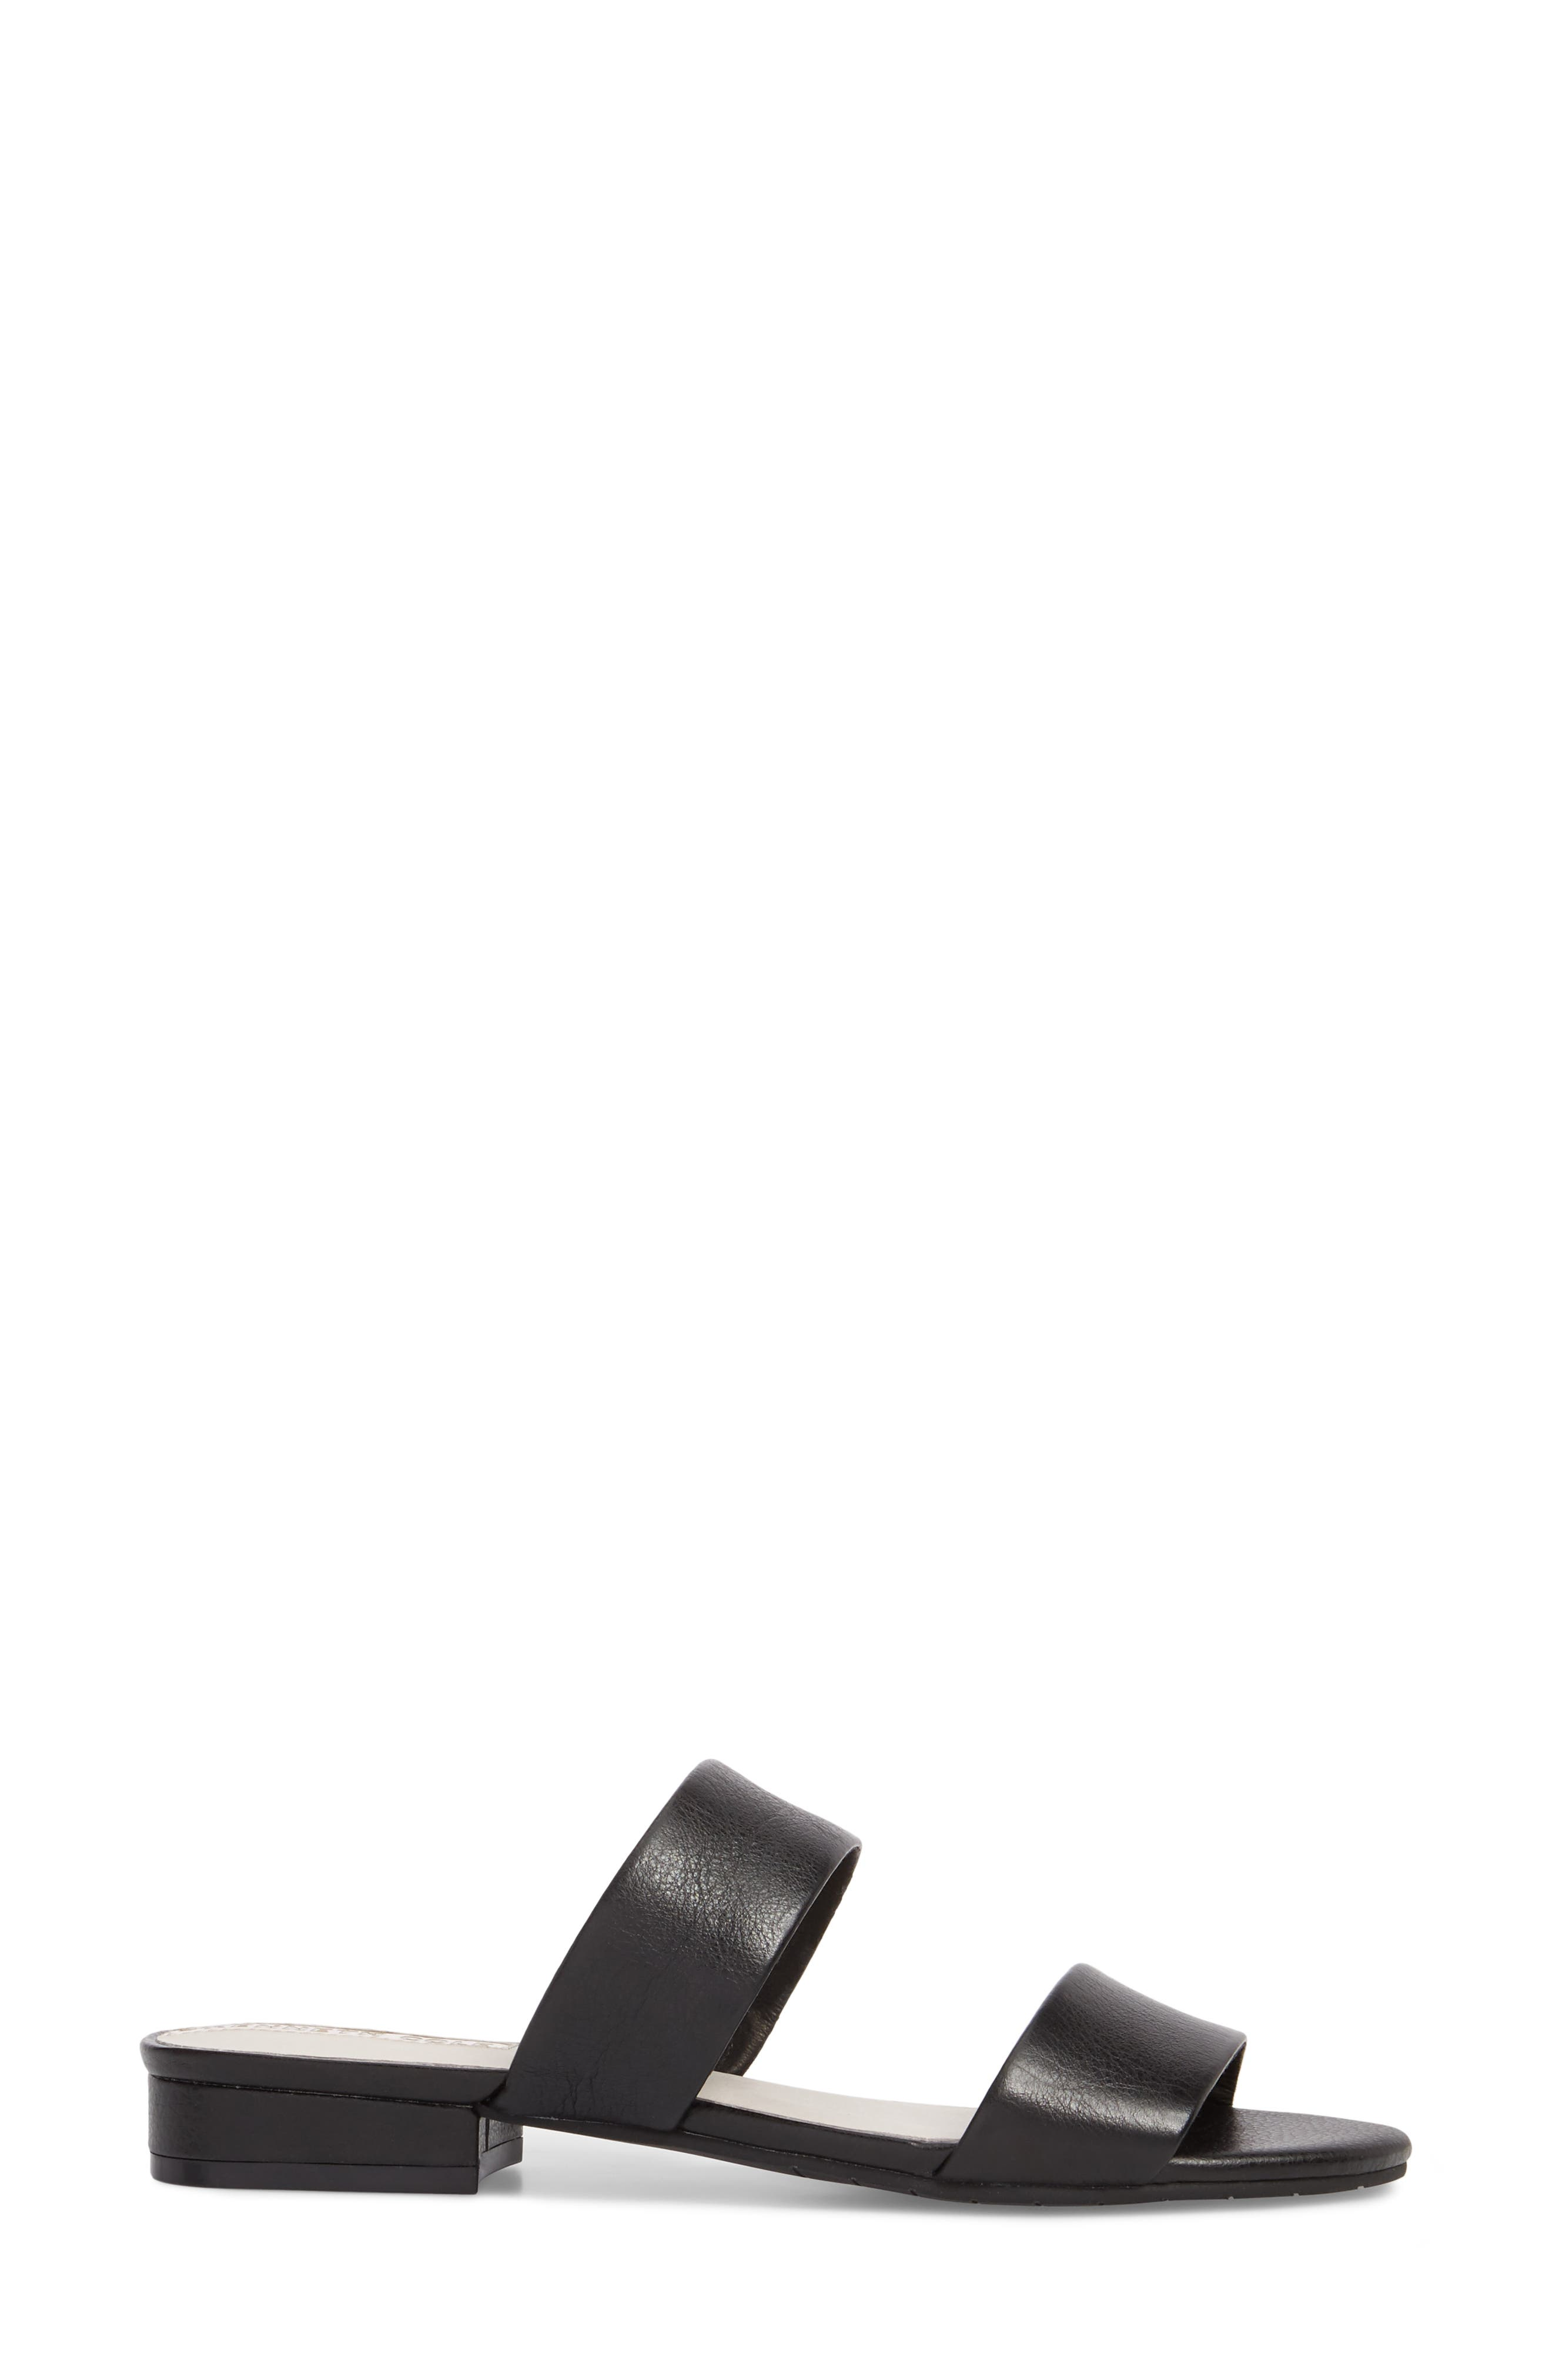 Viola Sandal,                             Alternate thumbnail 3, color,                             Black Leather